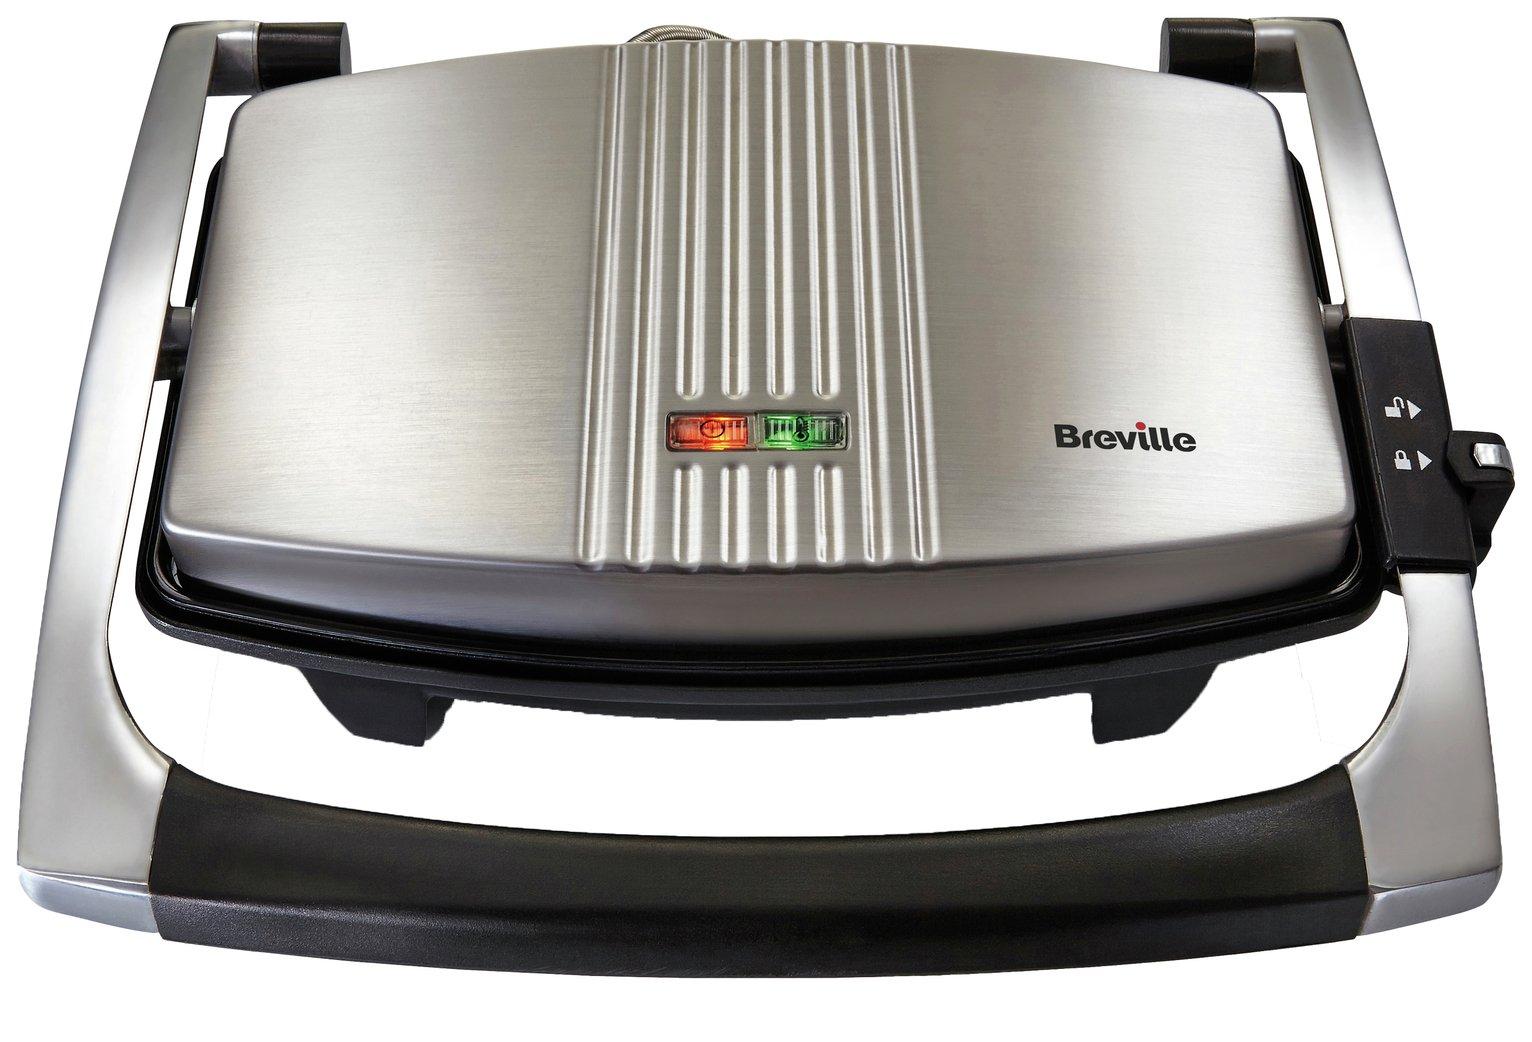 Image of Breville - Toaster - VST025 - 3 Slice Sandwich Press - Stainless Steel